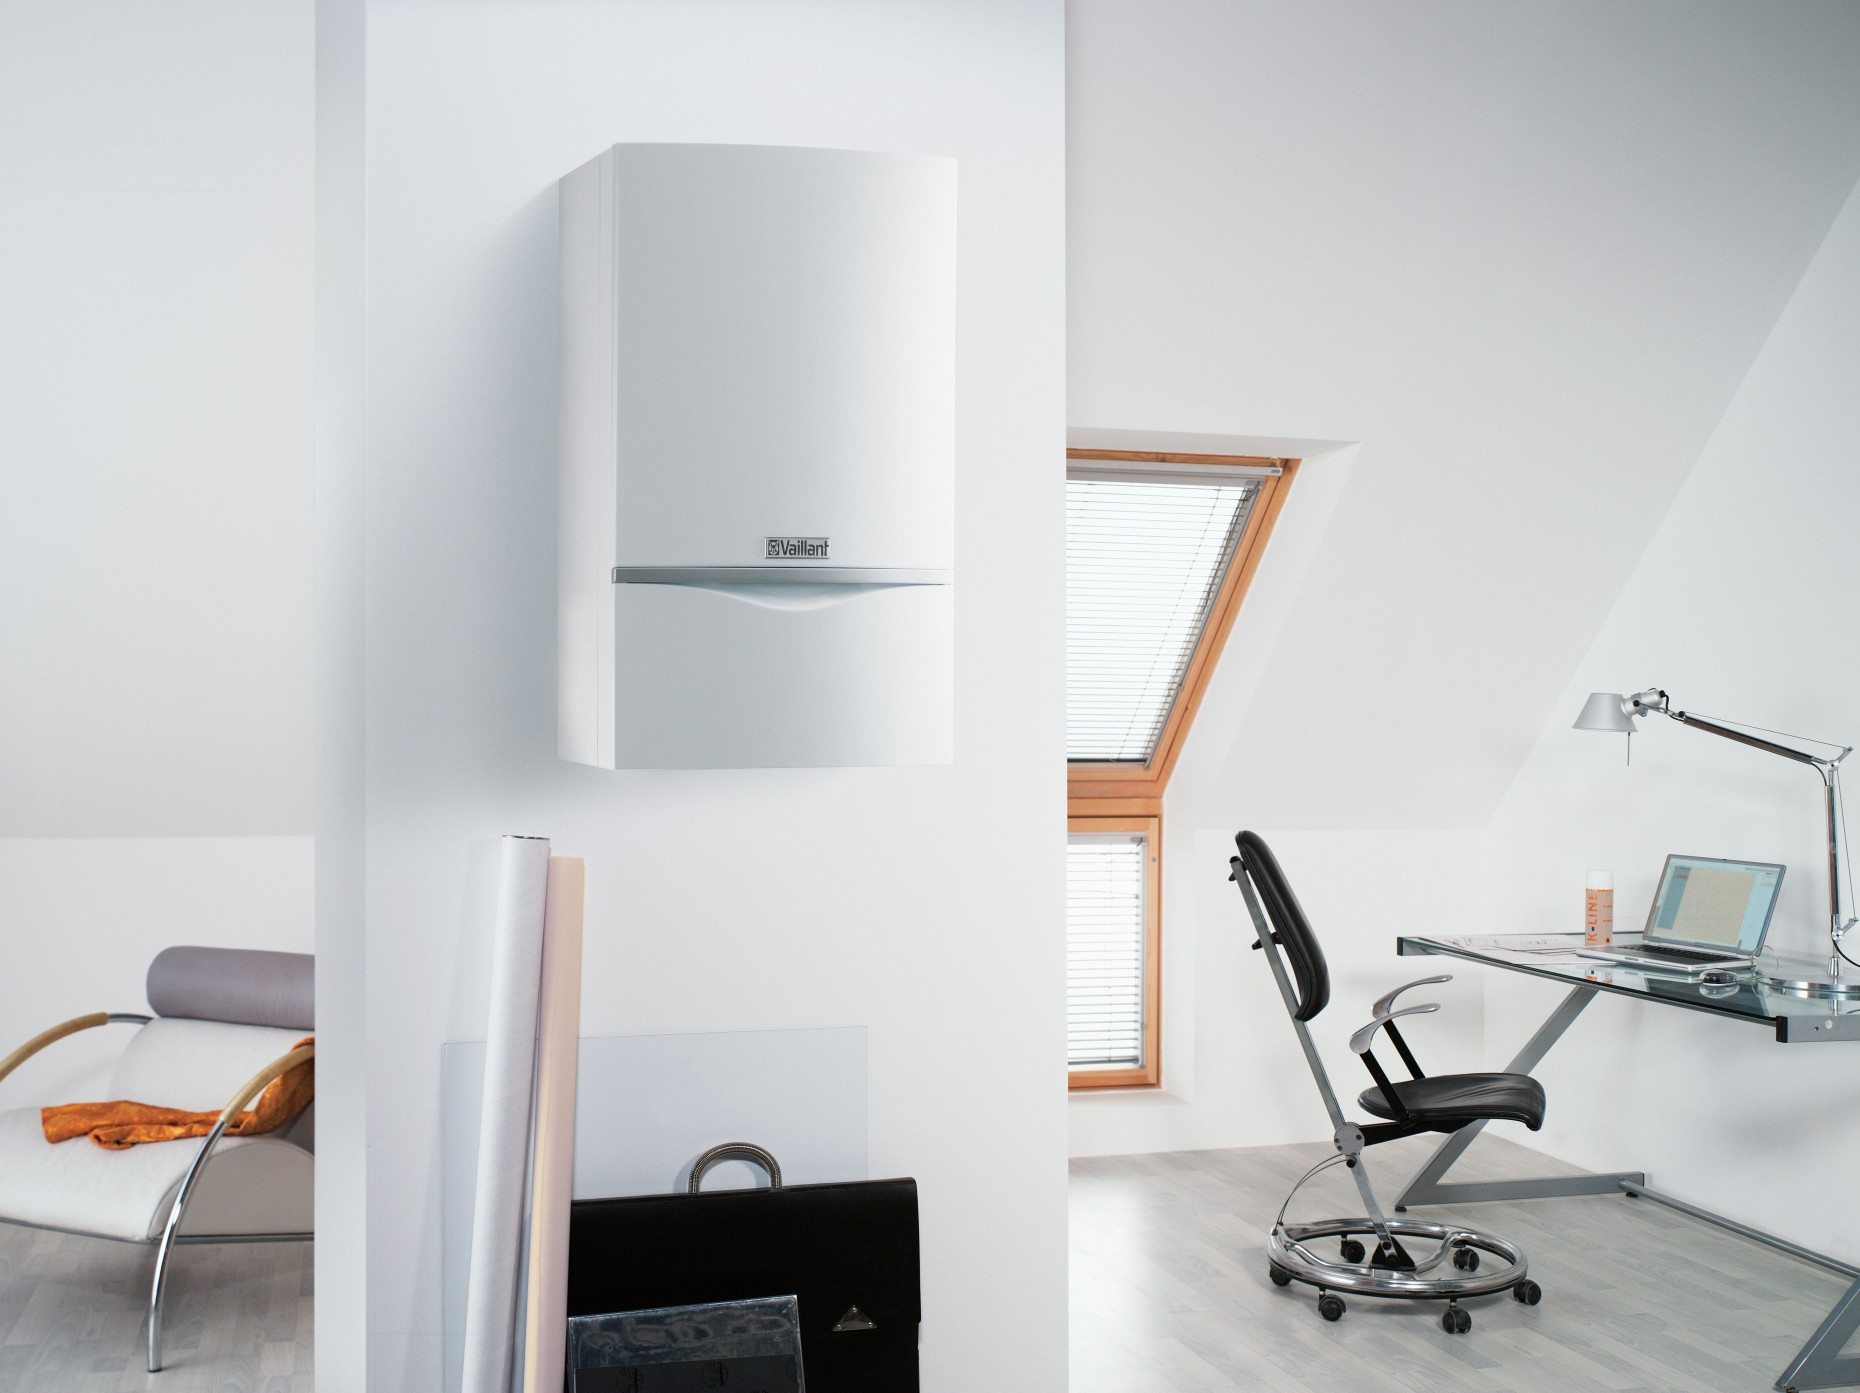 wandheizger t atmotec plus vc vcw produktinfos vaillant. Black Bedroom Furniture Sets. Home Design Ideas